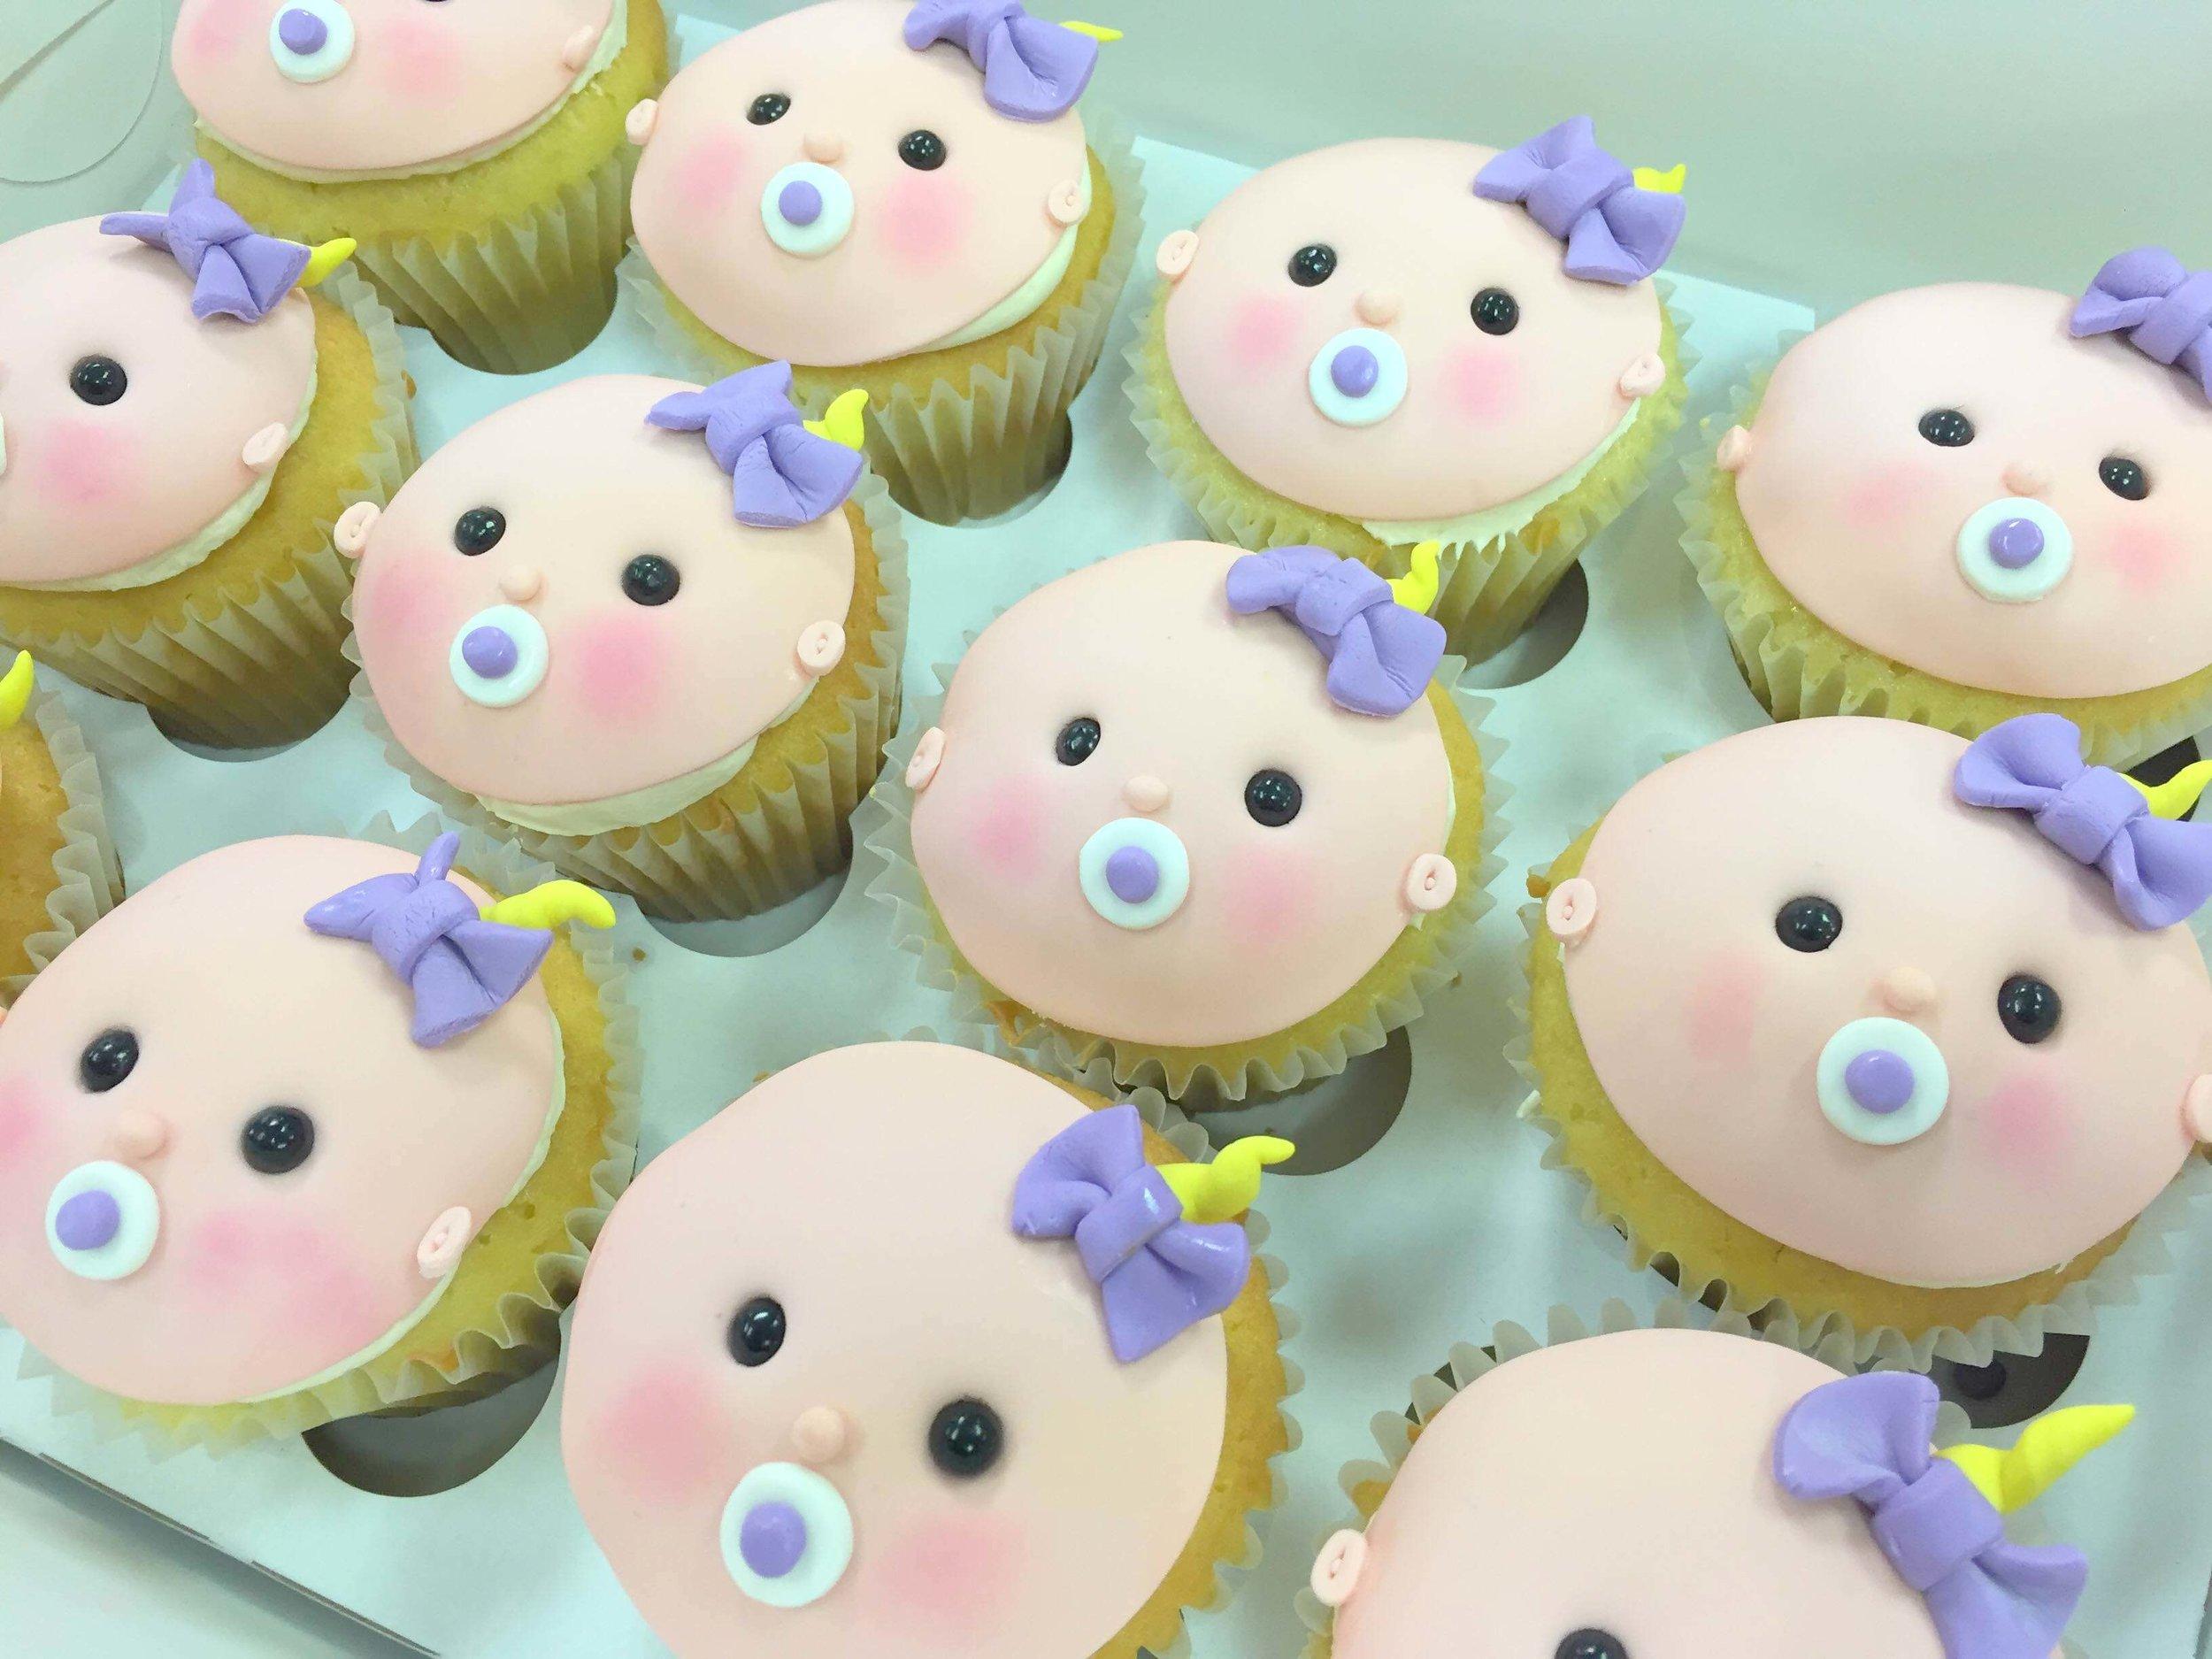 cupcakes-baby faces fondant.JPG